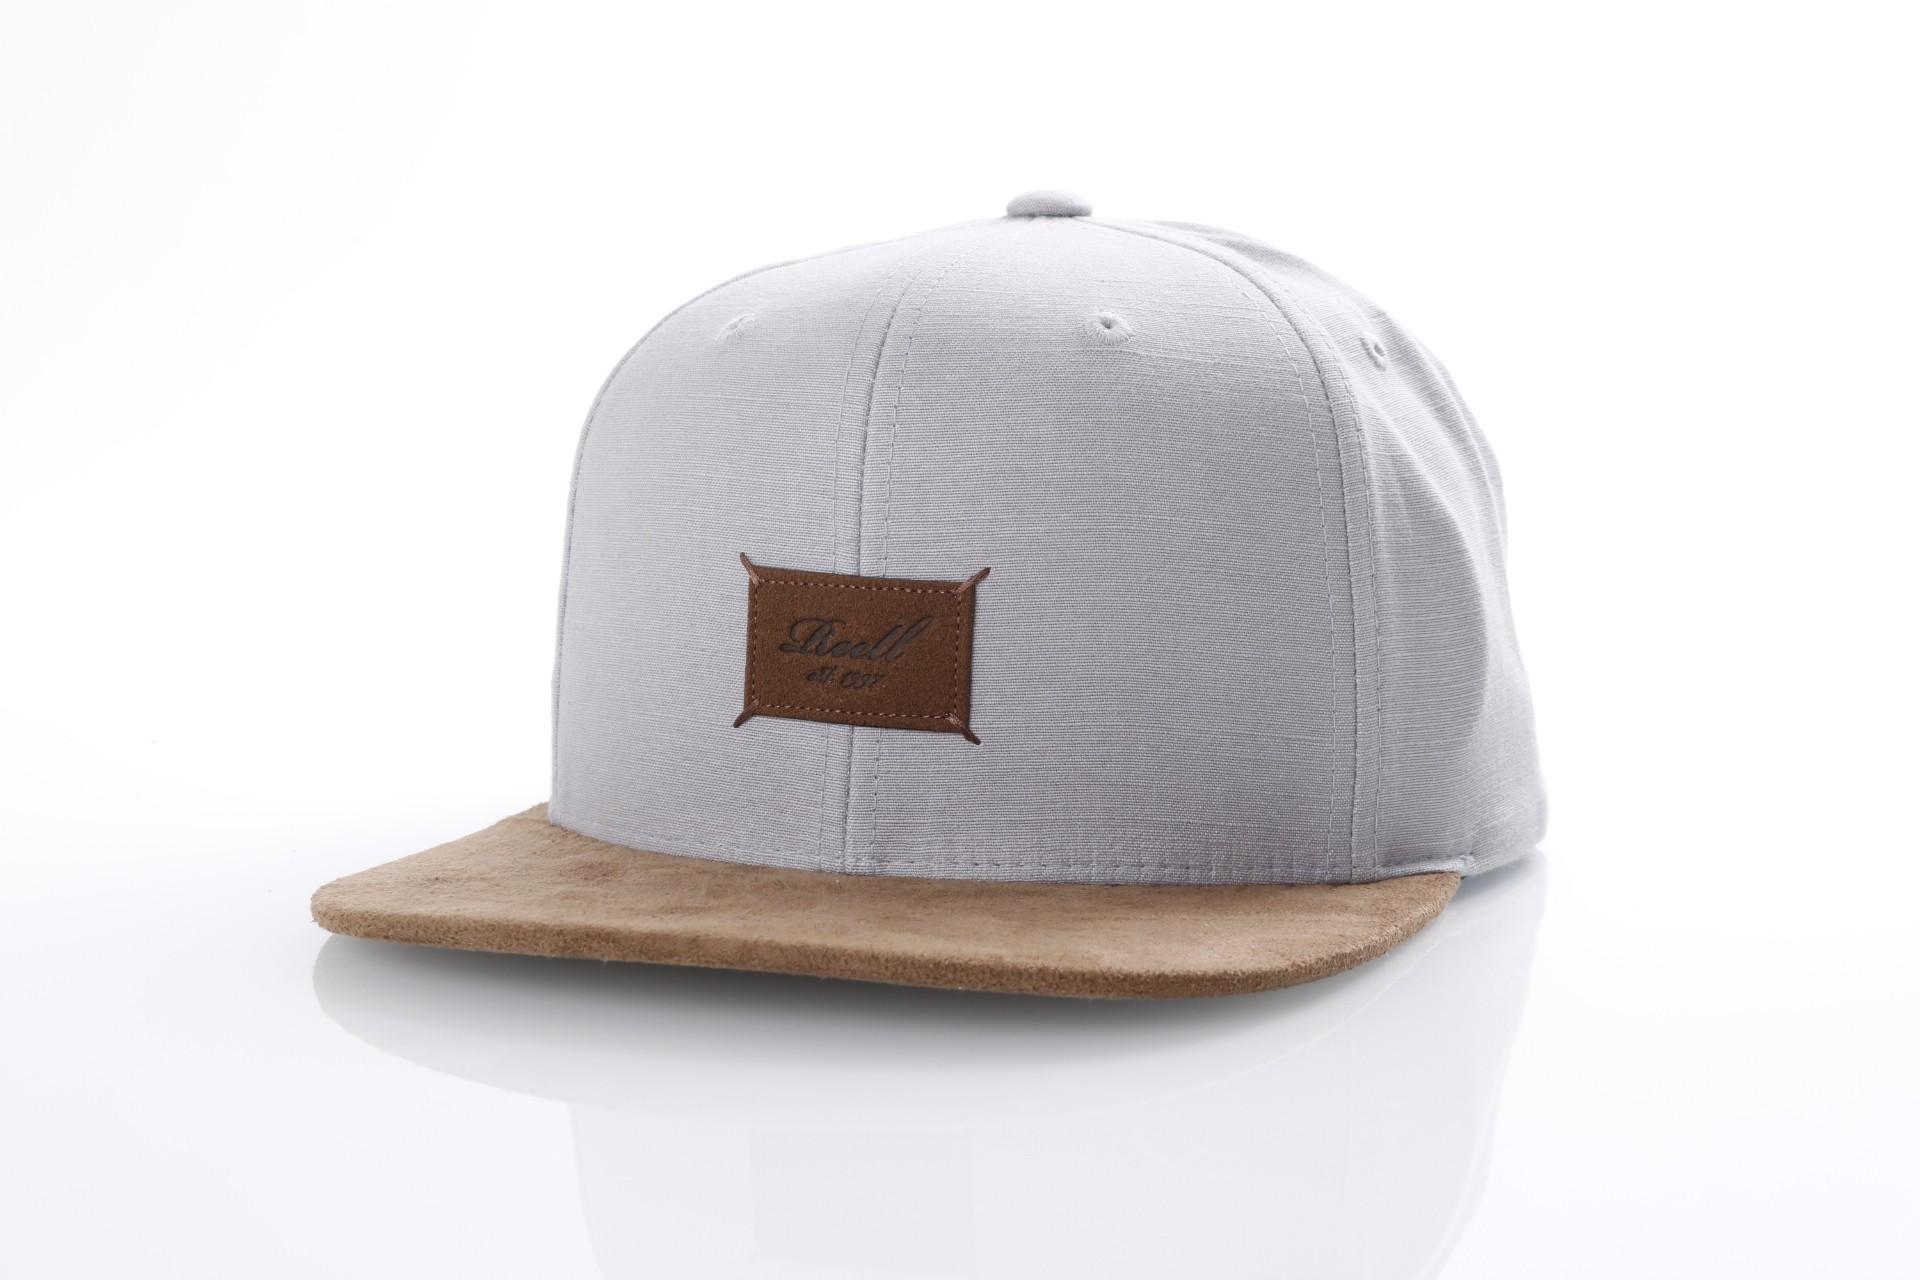 Afbeelding van Reell Snapback cap Suede 6-Panel Light Grey Slub